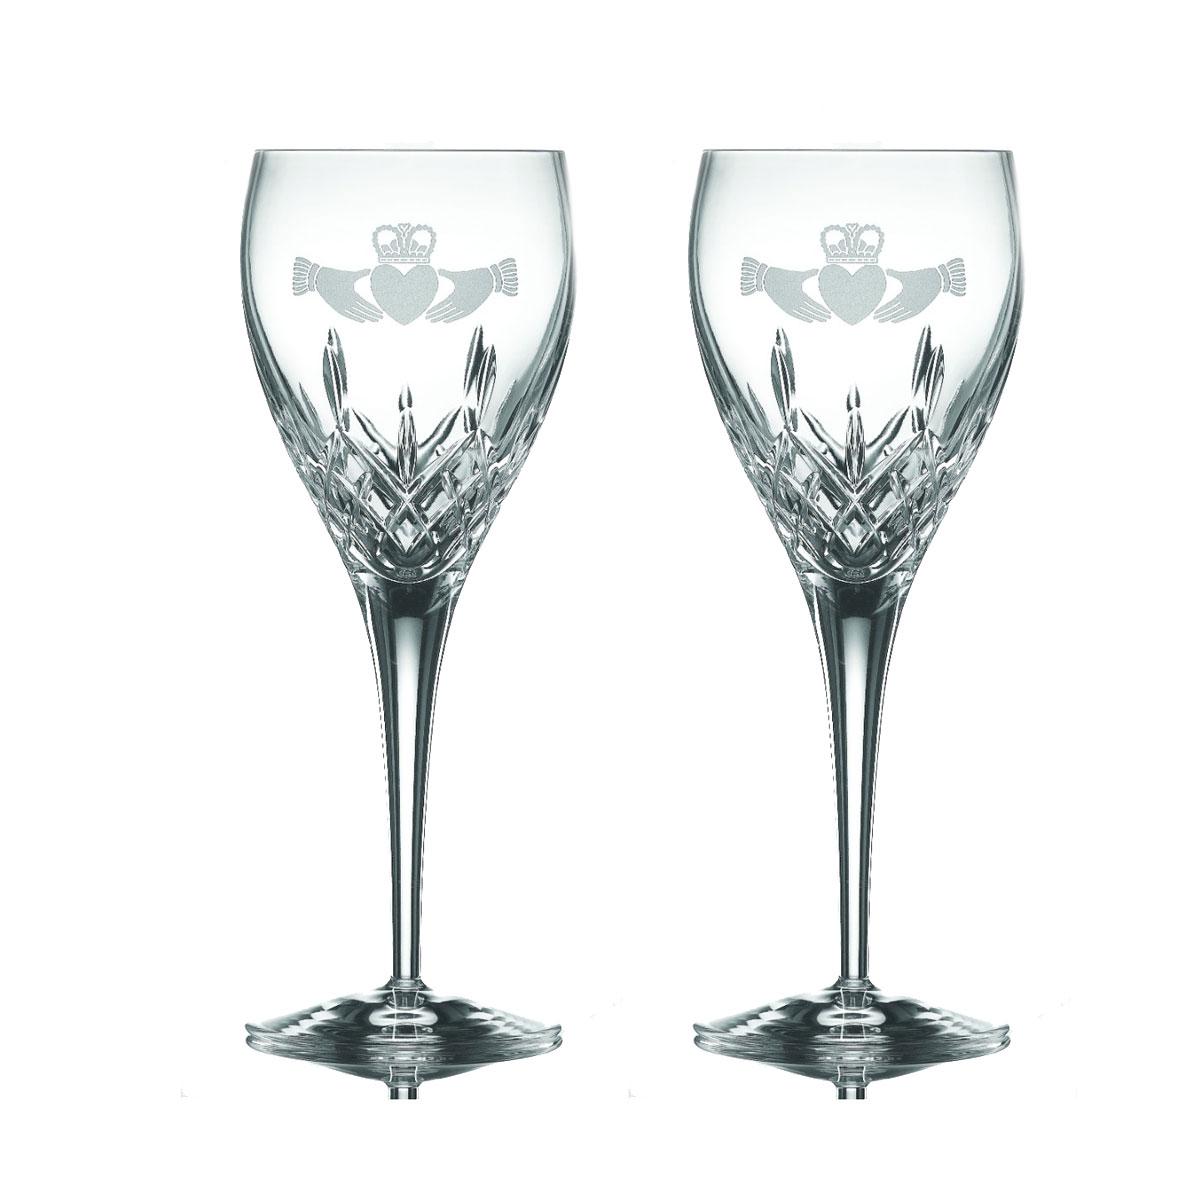 Galway Crystal Claddagh Friendship Goblet, Pair